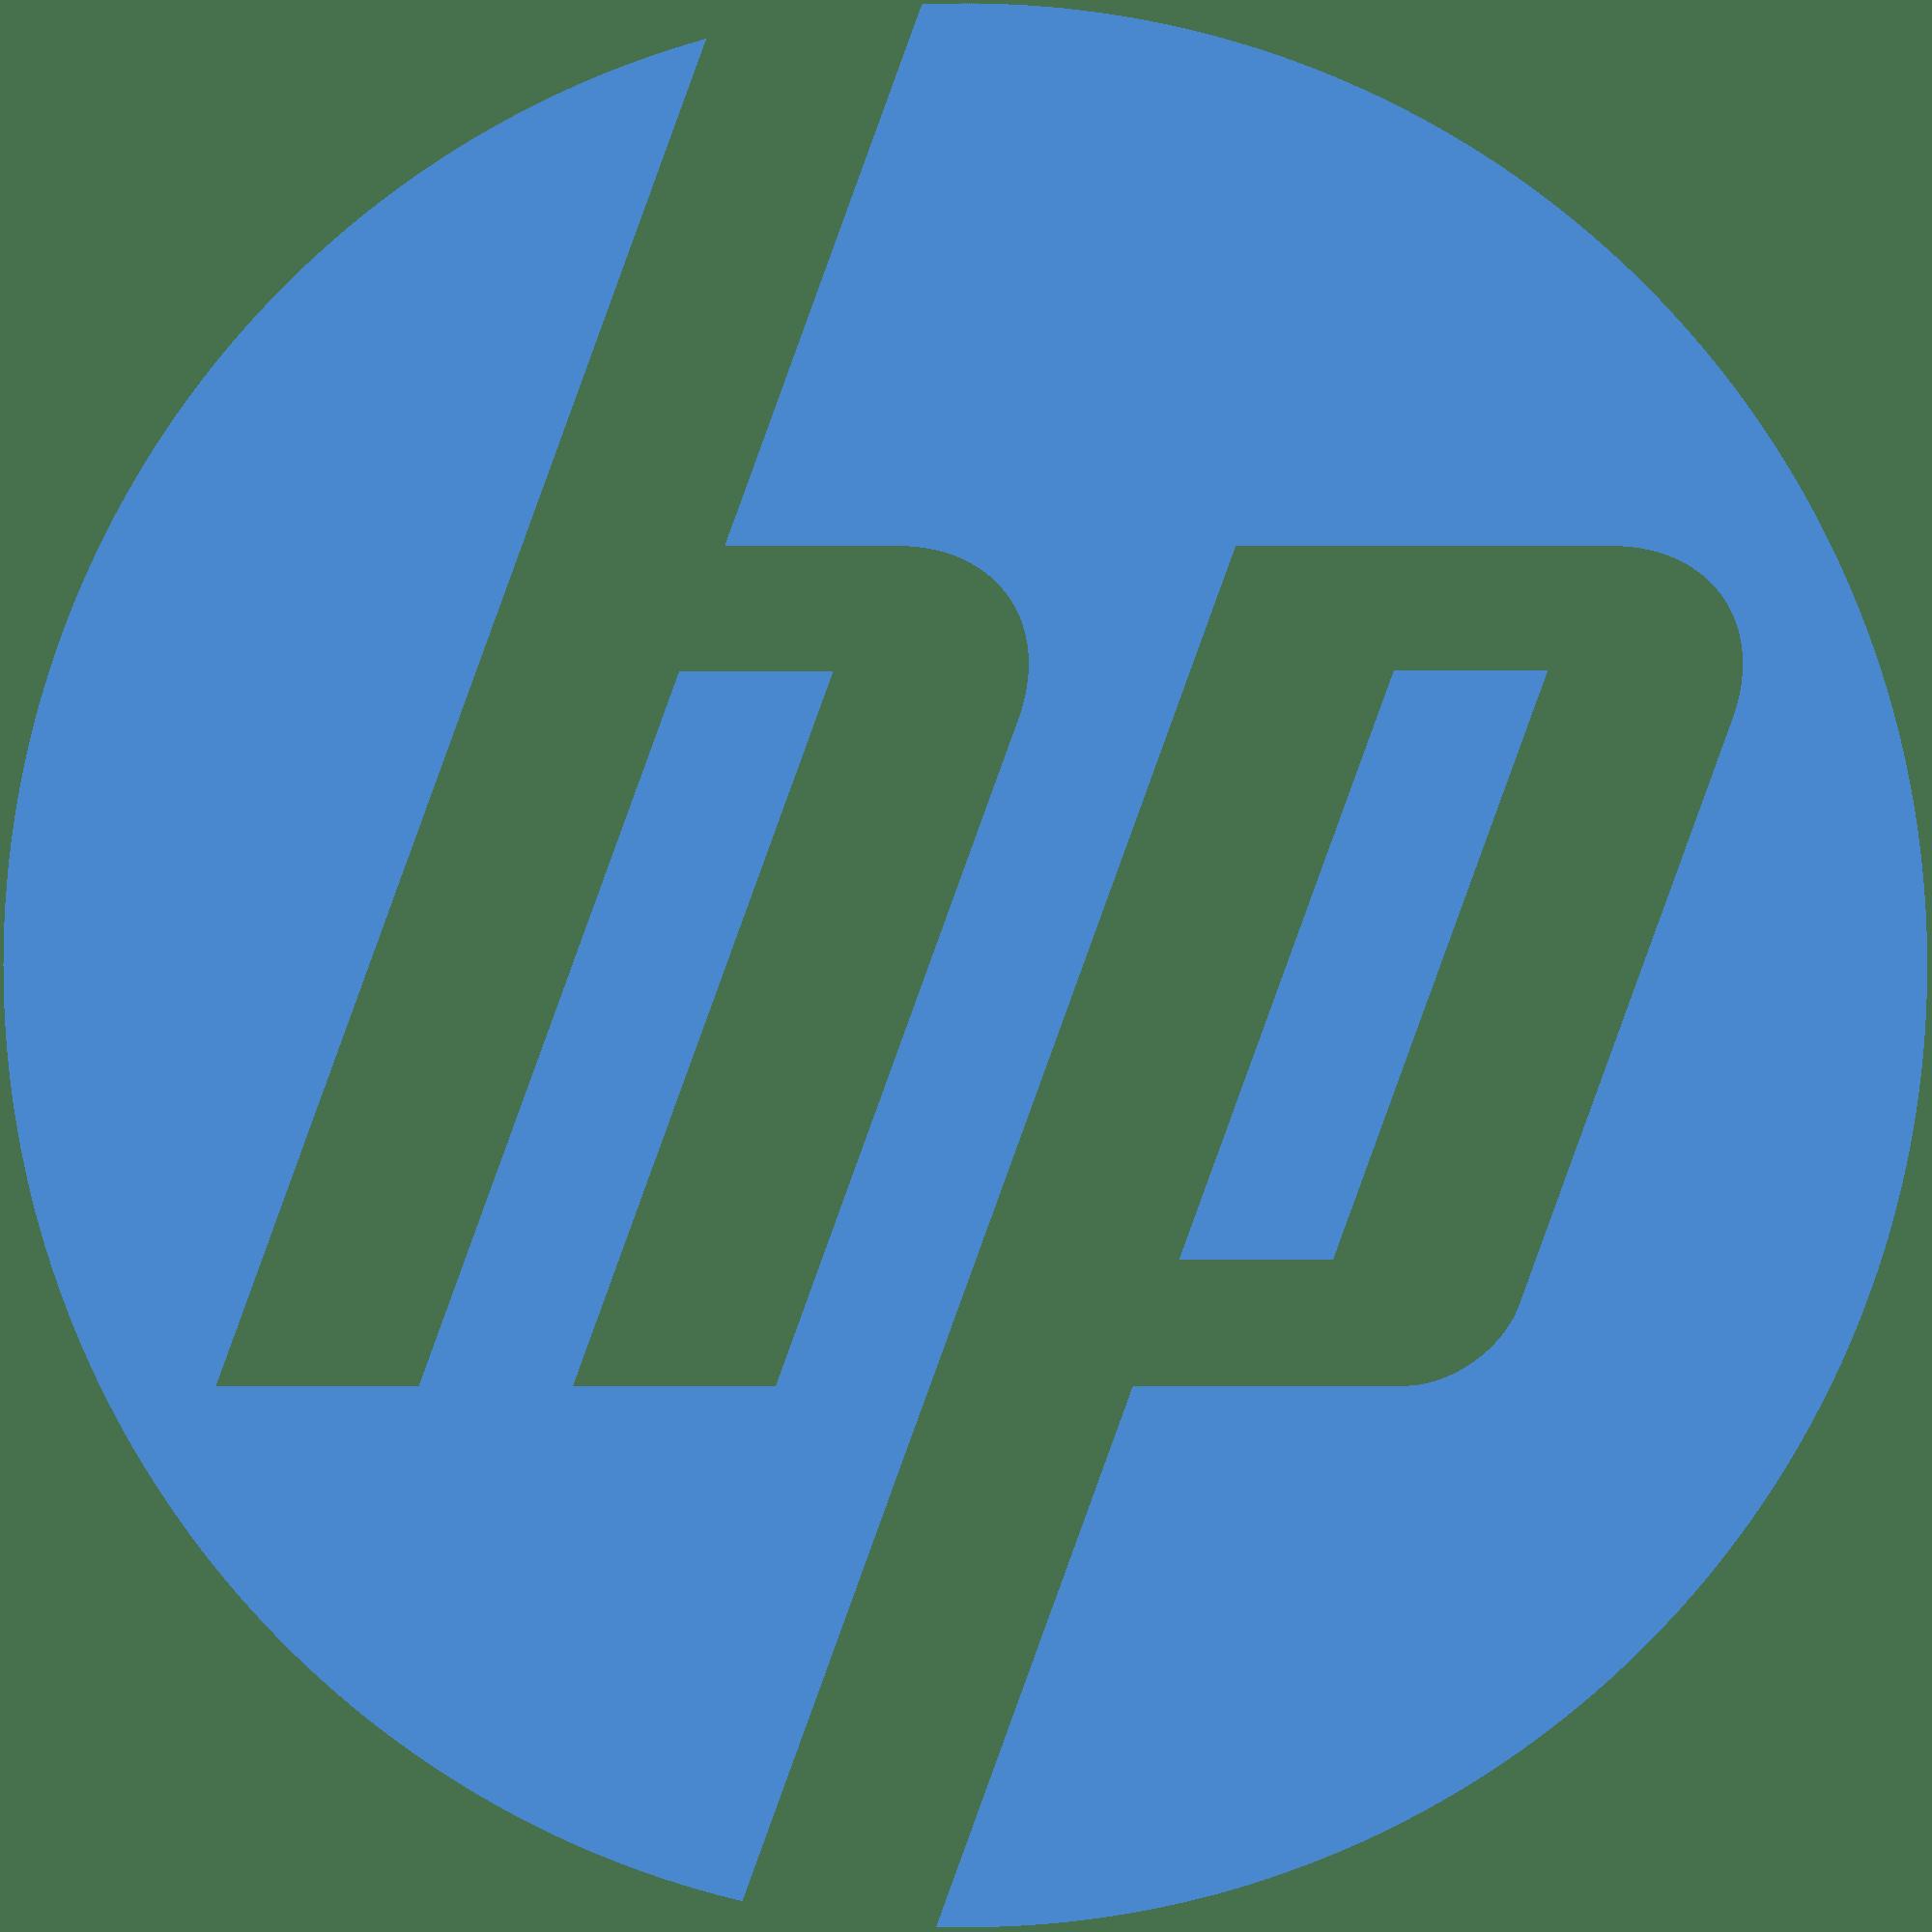 HP Deskjet Ink Advantage 1515 All-in-One Printer drivers